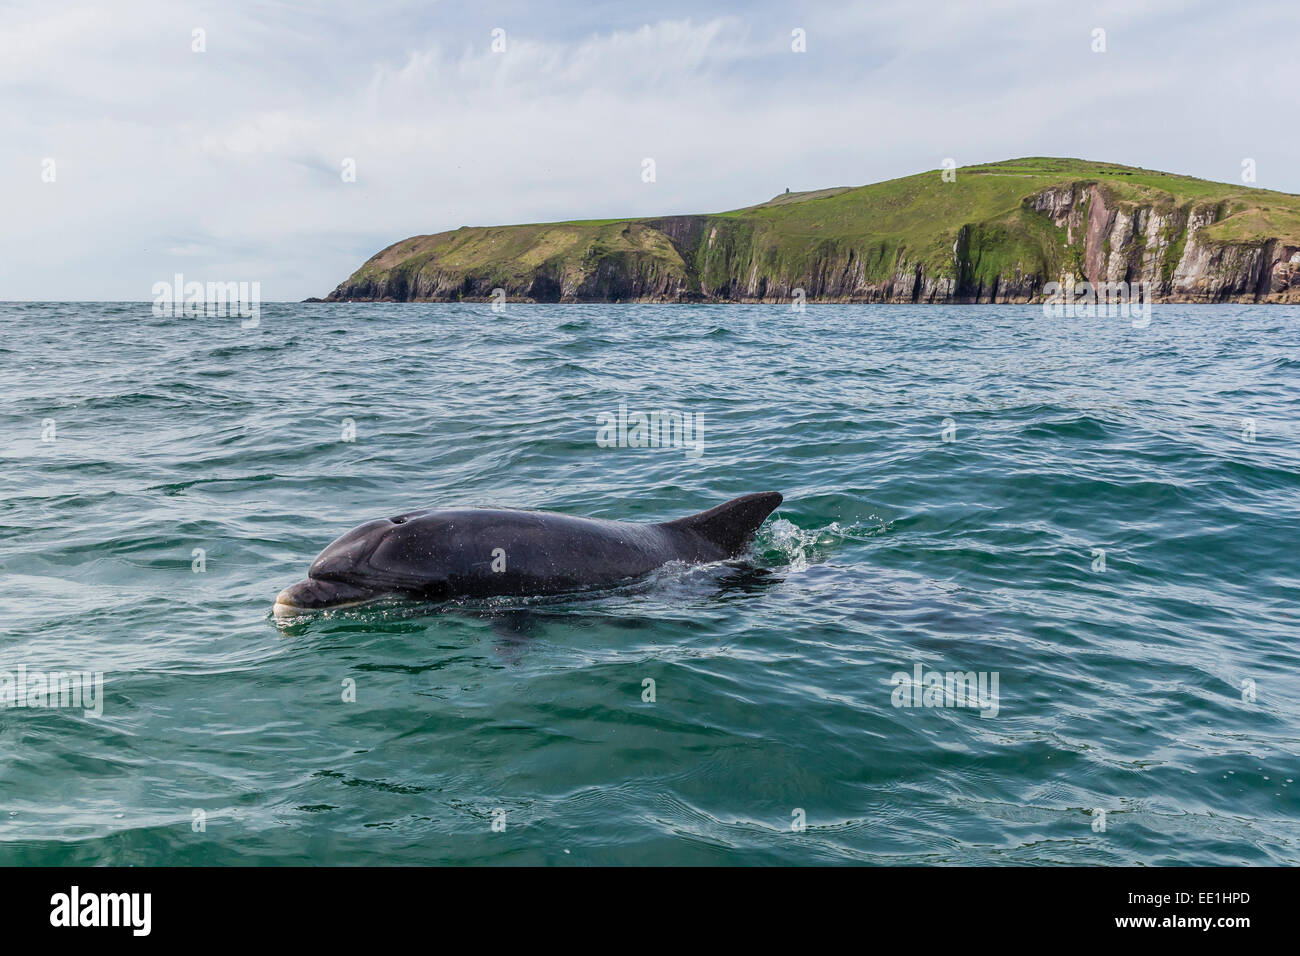 Adult bottlenose dolphin (Tursiops truncates) near the Dingle Peninsula, County Kerry, Munster, Republic of Ireland Stock Photo